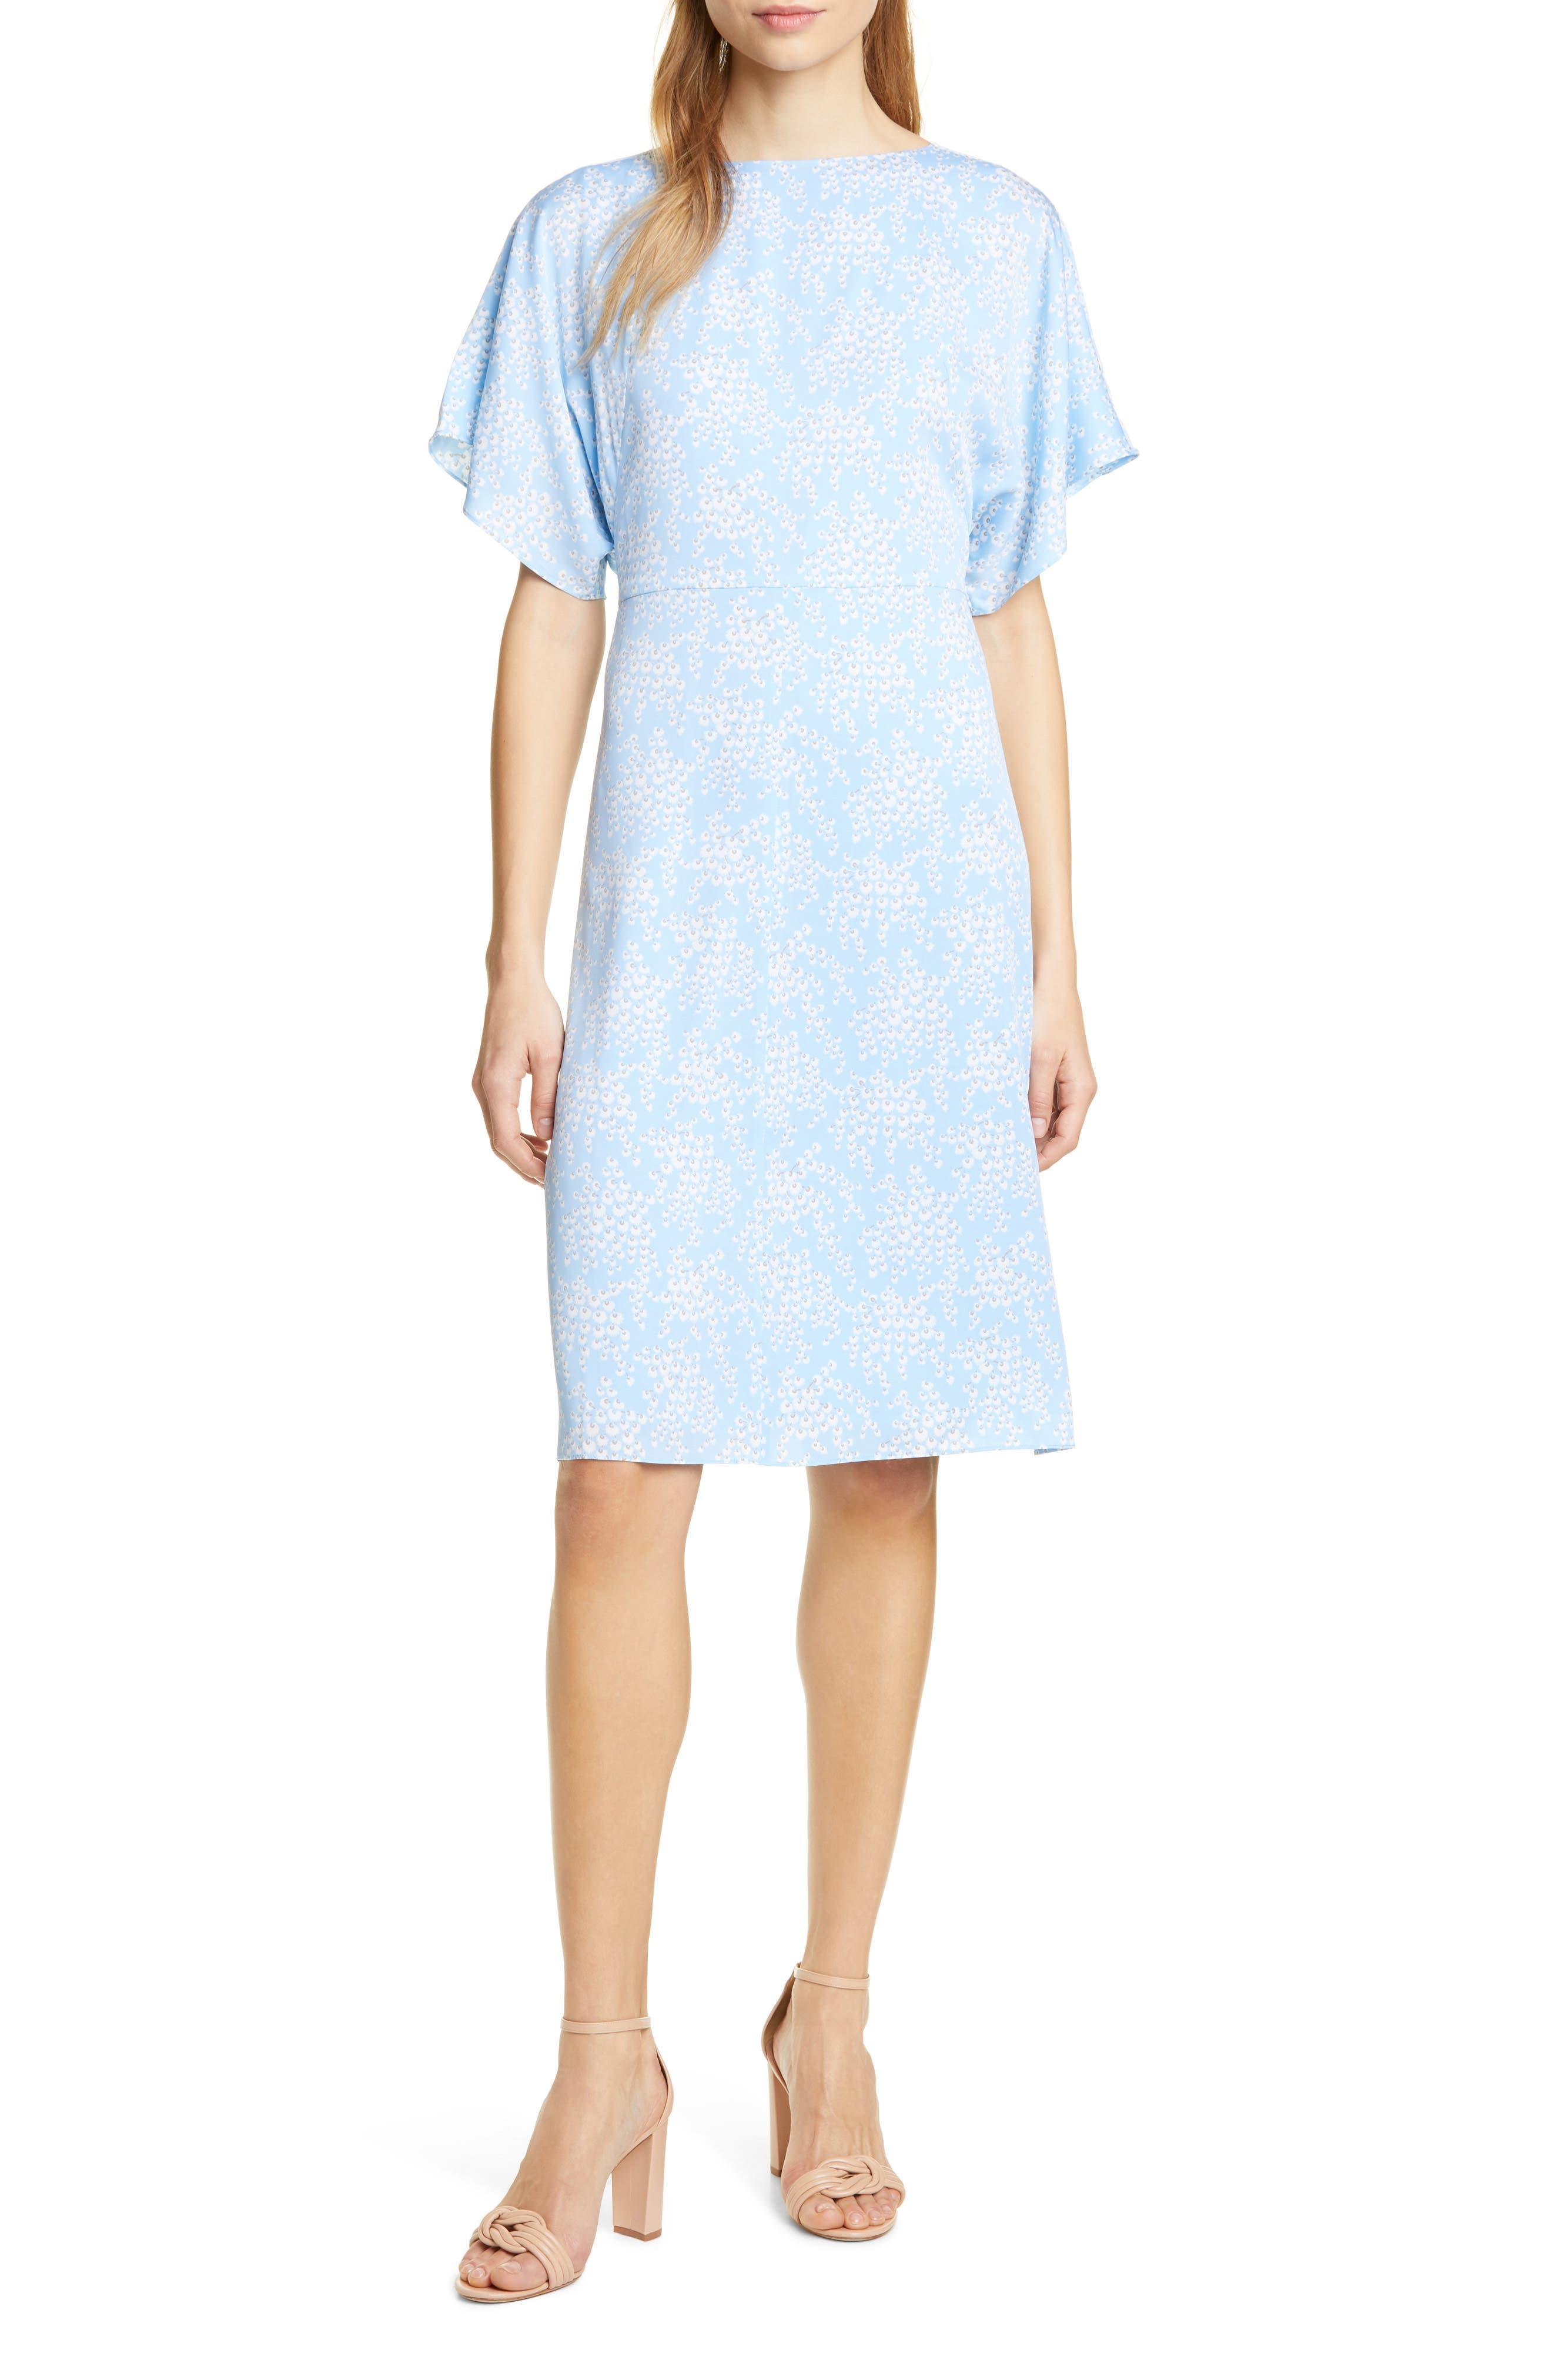 LEWIT Kimono Sleeve Stretch Silk Dress, Main, color, BLUE SIDDAL FLORAL